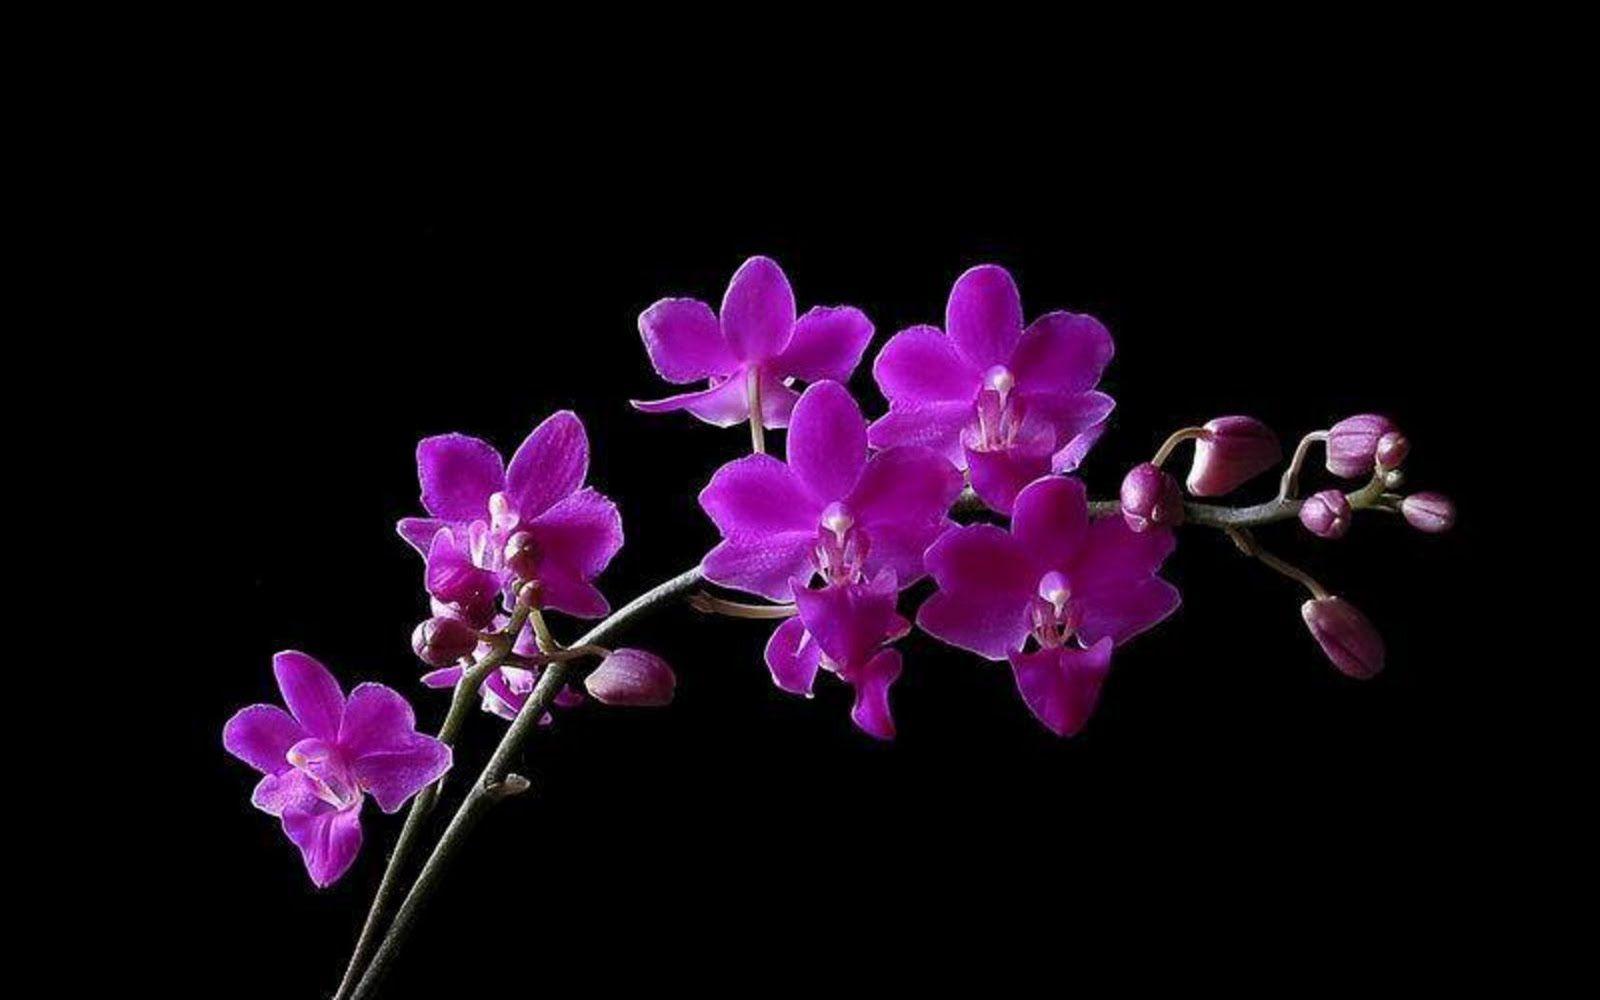 Beautiful Orchid Flower Hd , HD Wallpaper & Backgrounds